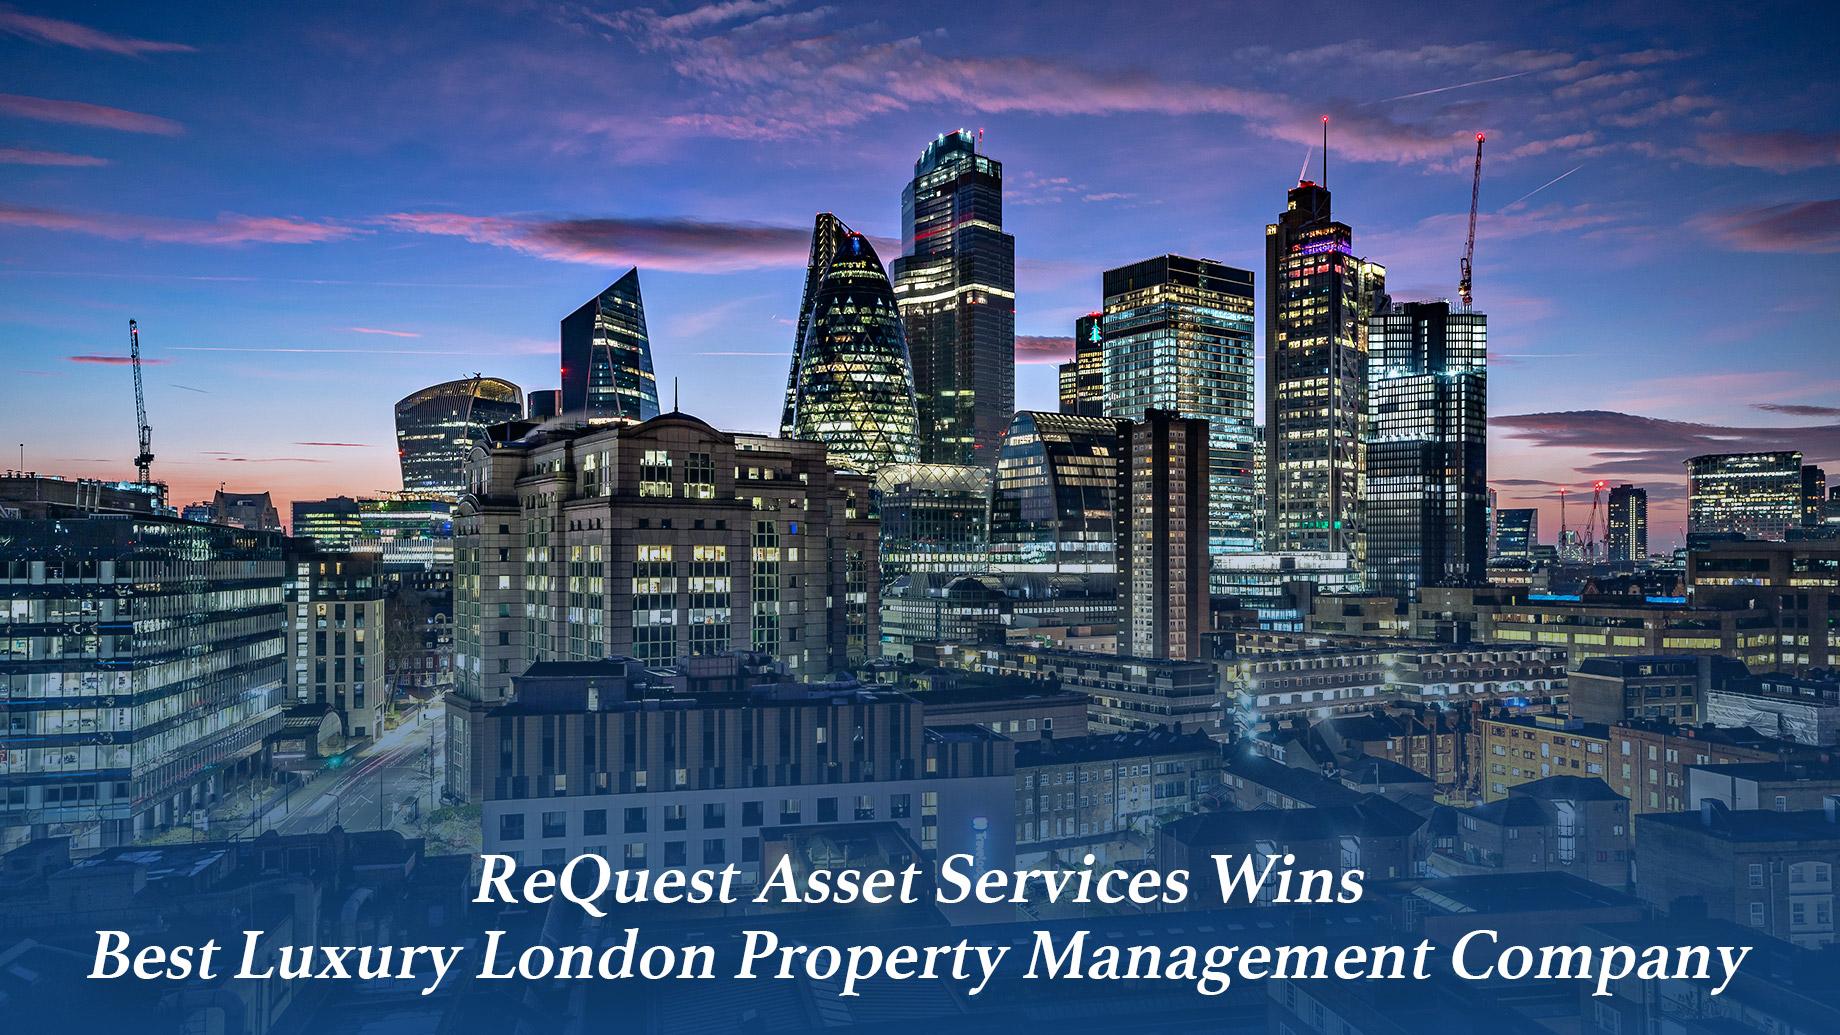 ReQuest Asset Services Wins Best Luxury London Property Management Company